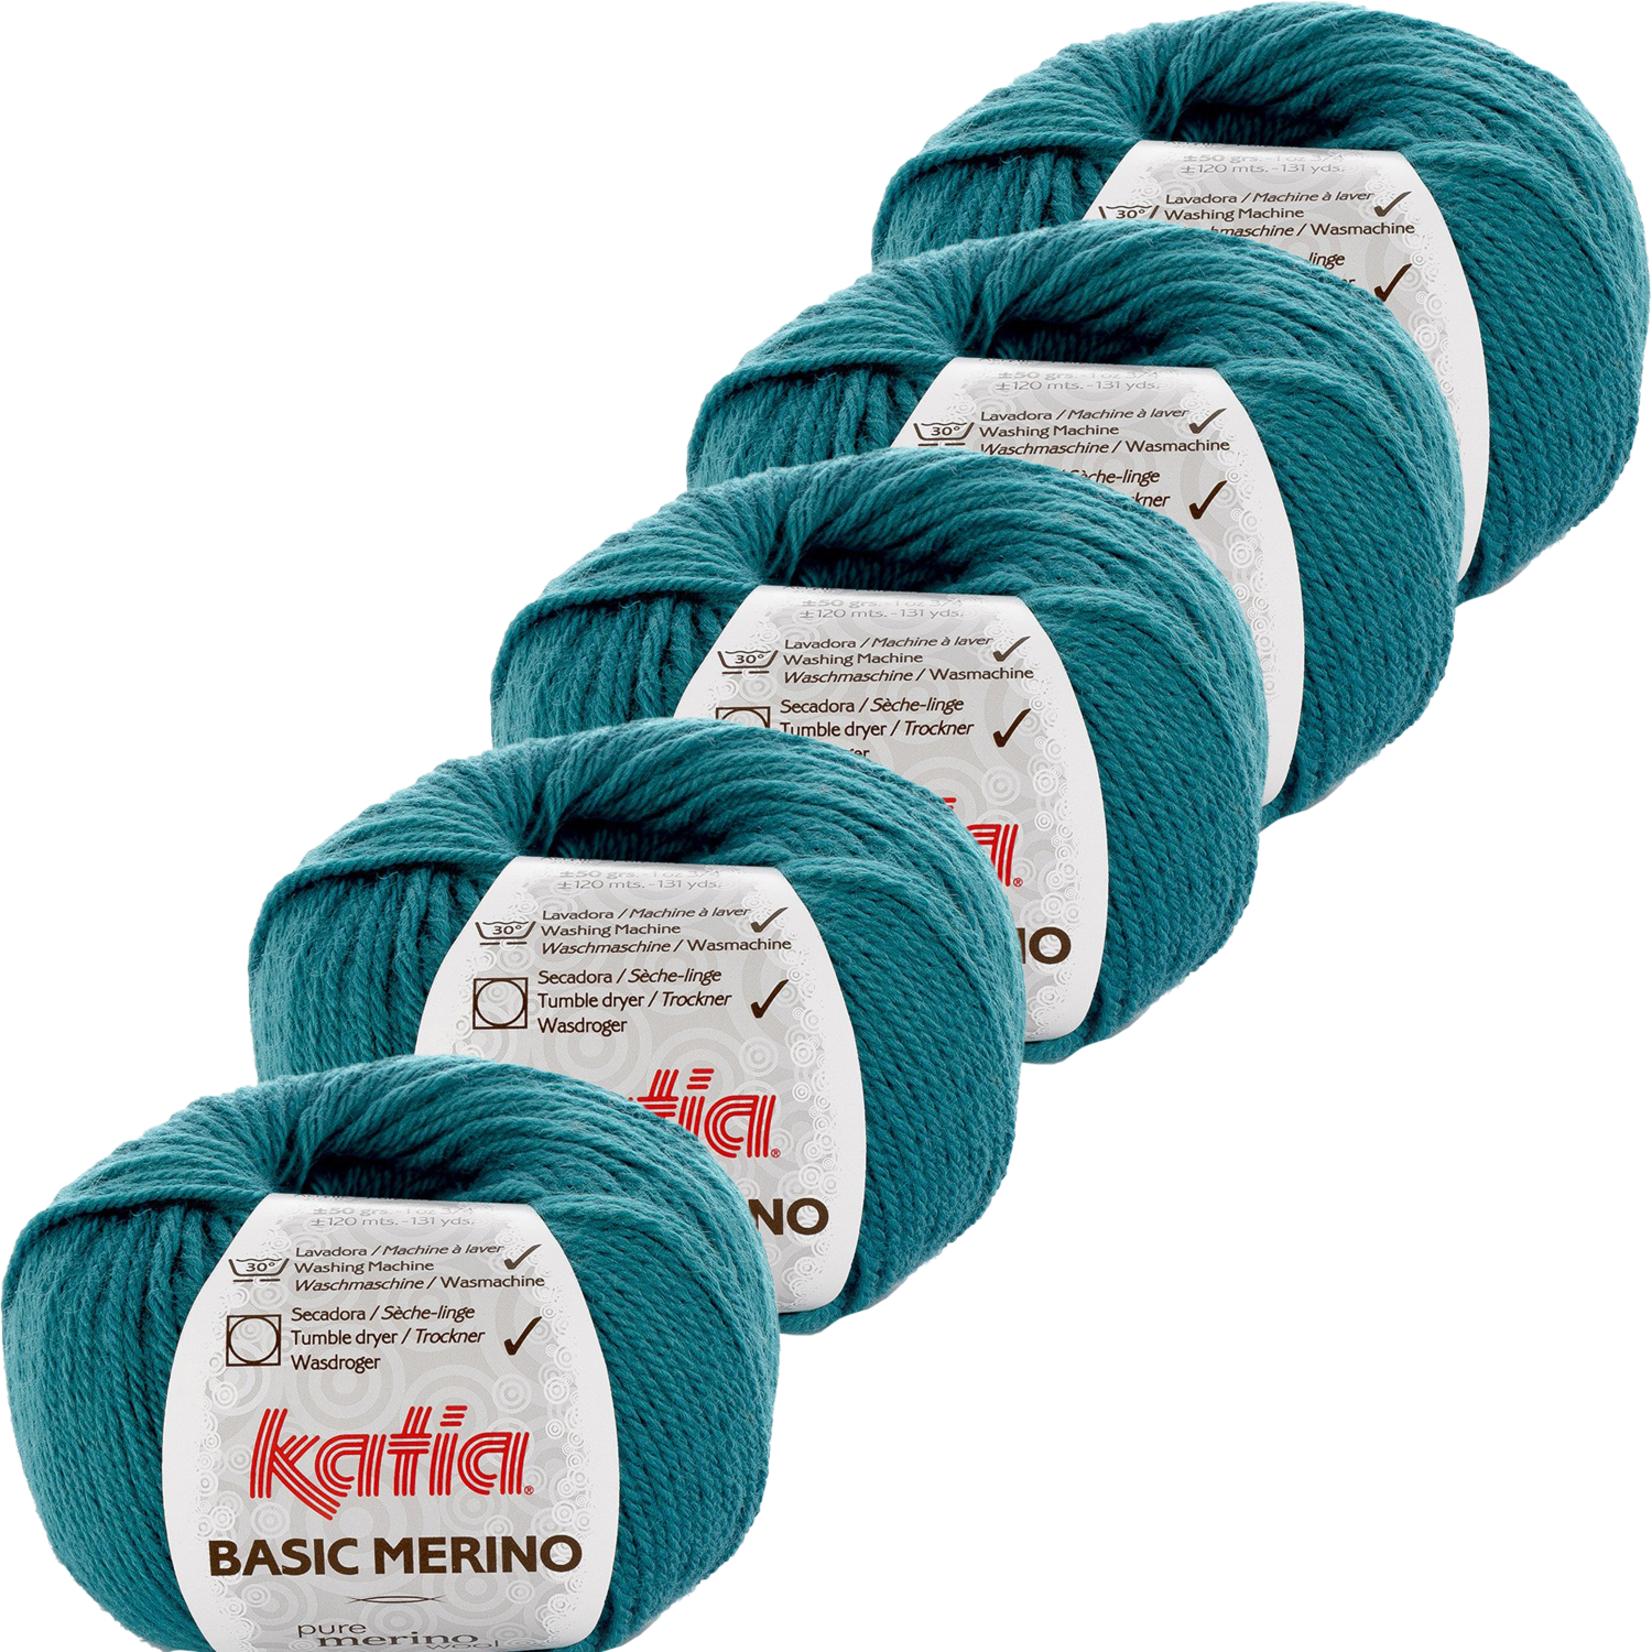 Katia Basic Merino - kleur 39_Groenblauw - bundel 5 bollen 50 gr.  van 120 m.